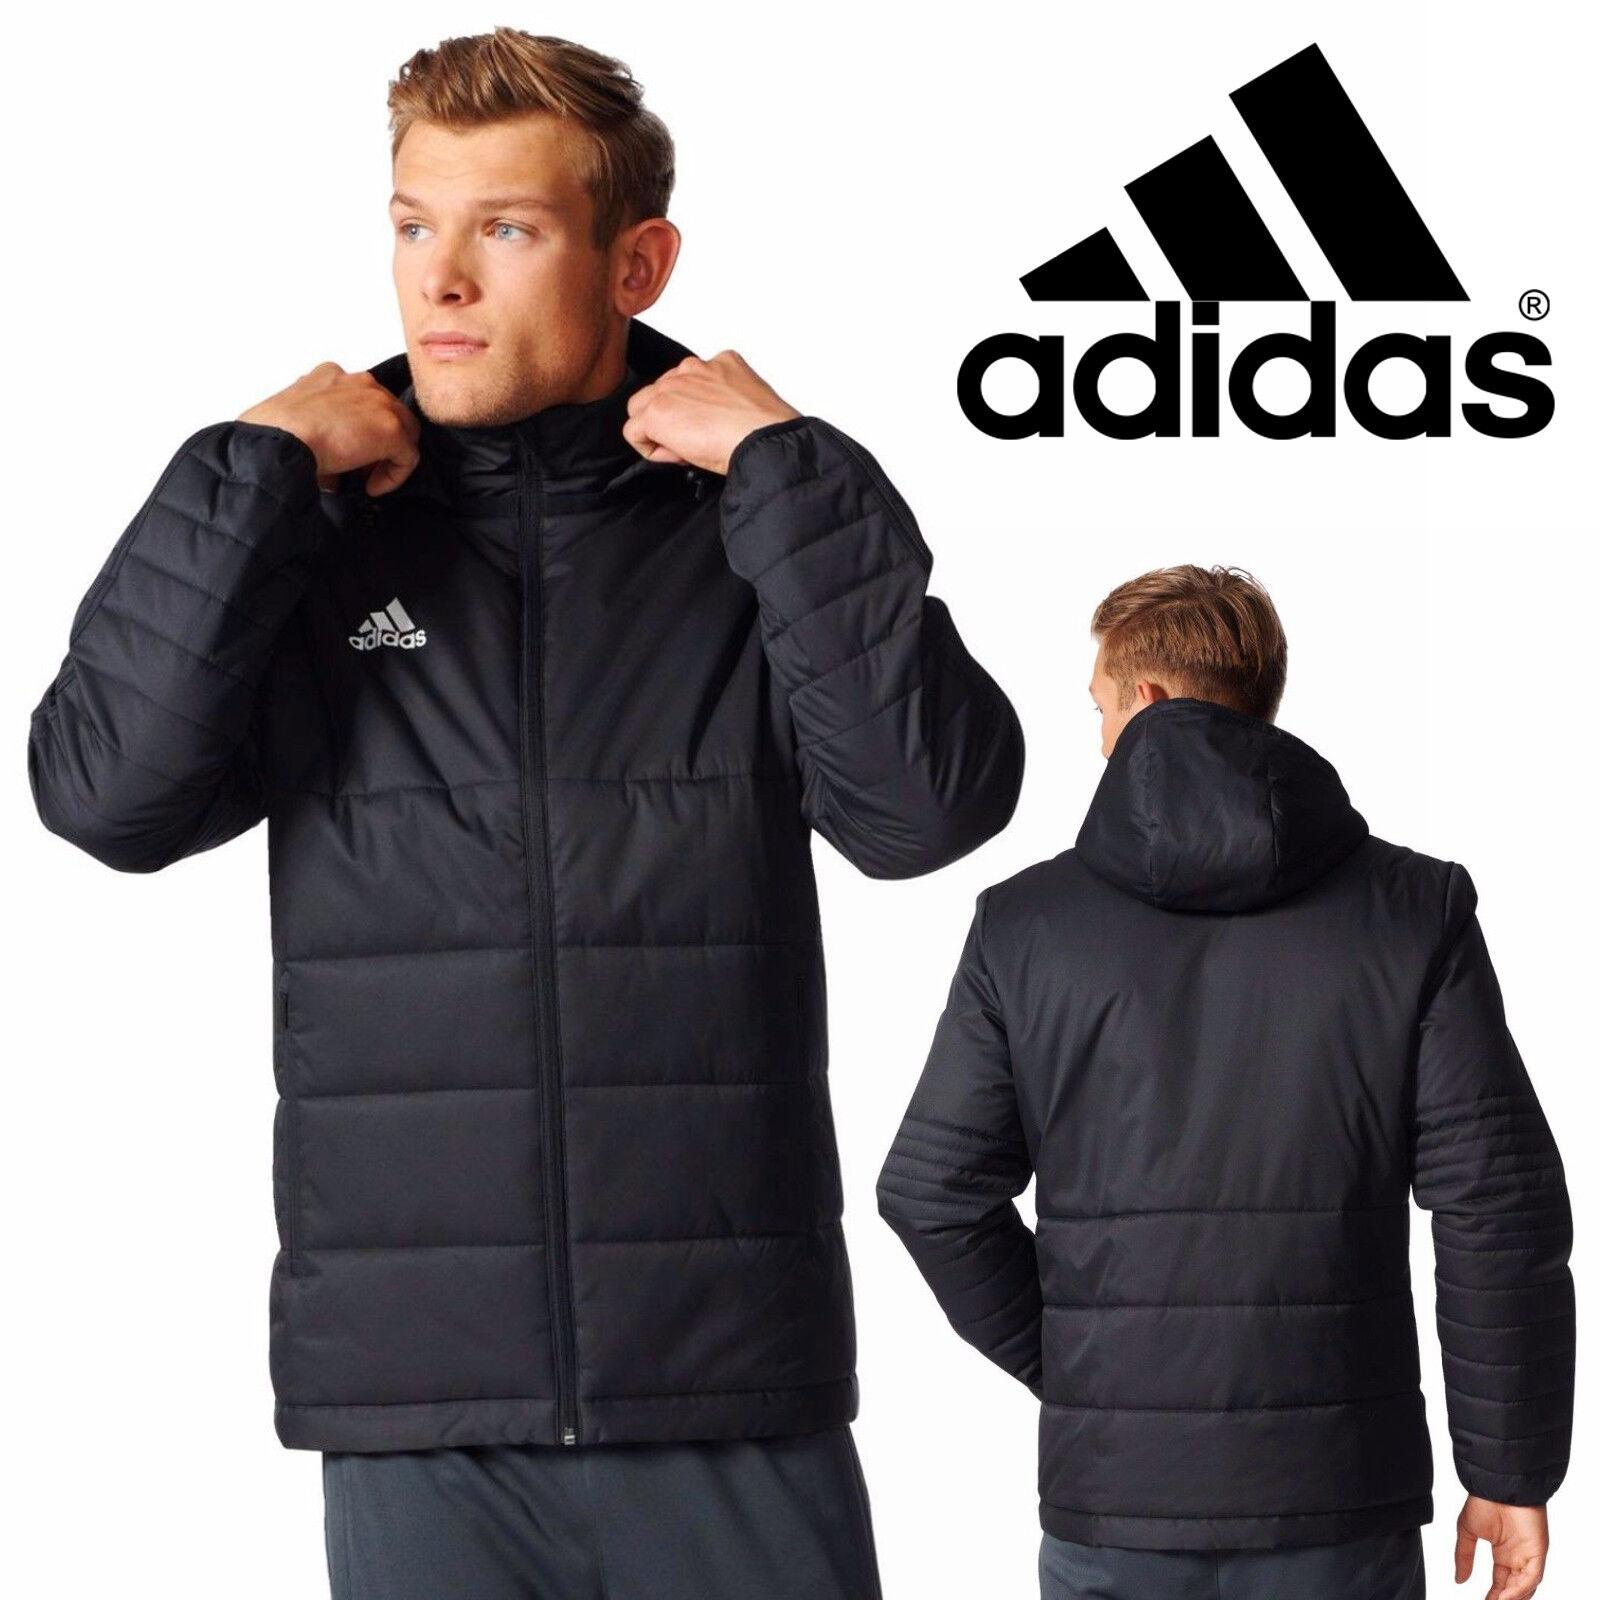 Adidas Performance Herren Tiro 17 Winterjacke Schwarz Gesteppt Sport Fußball Mantel | eBay